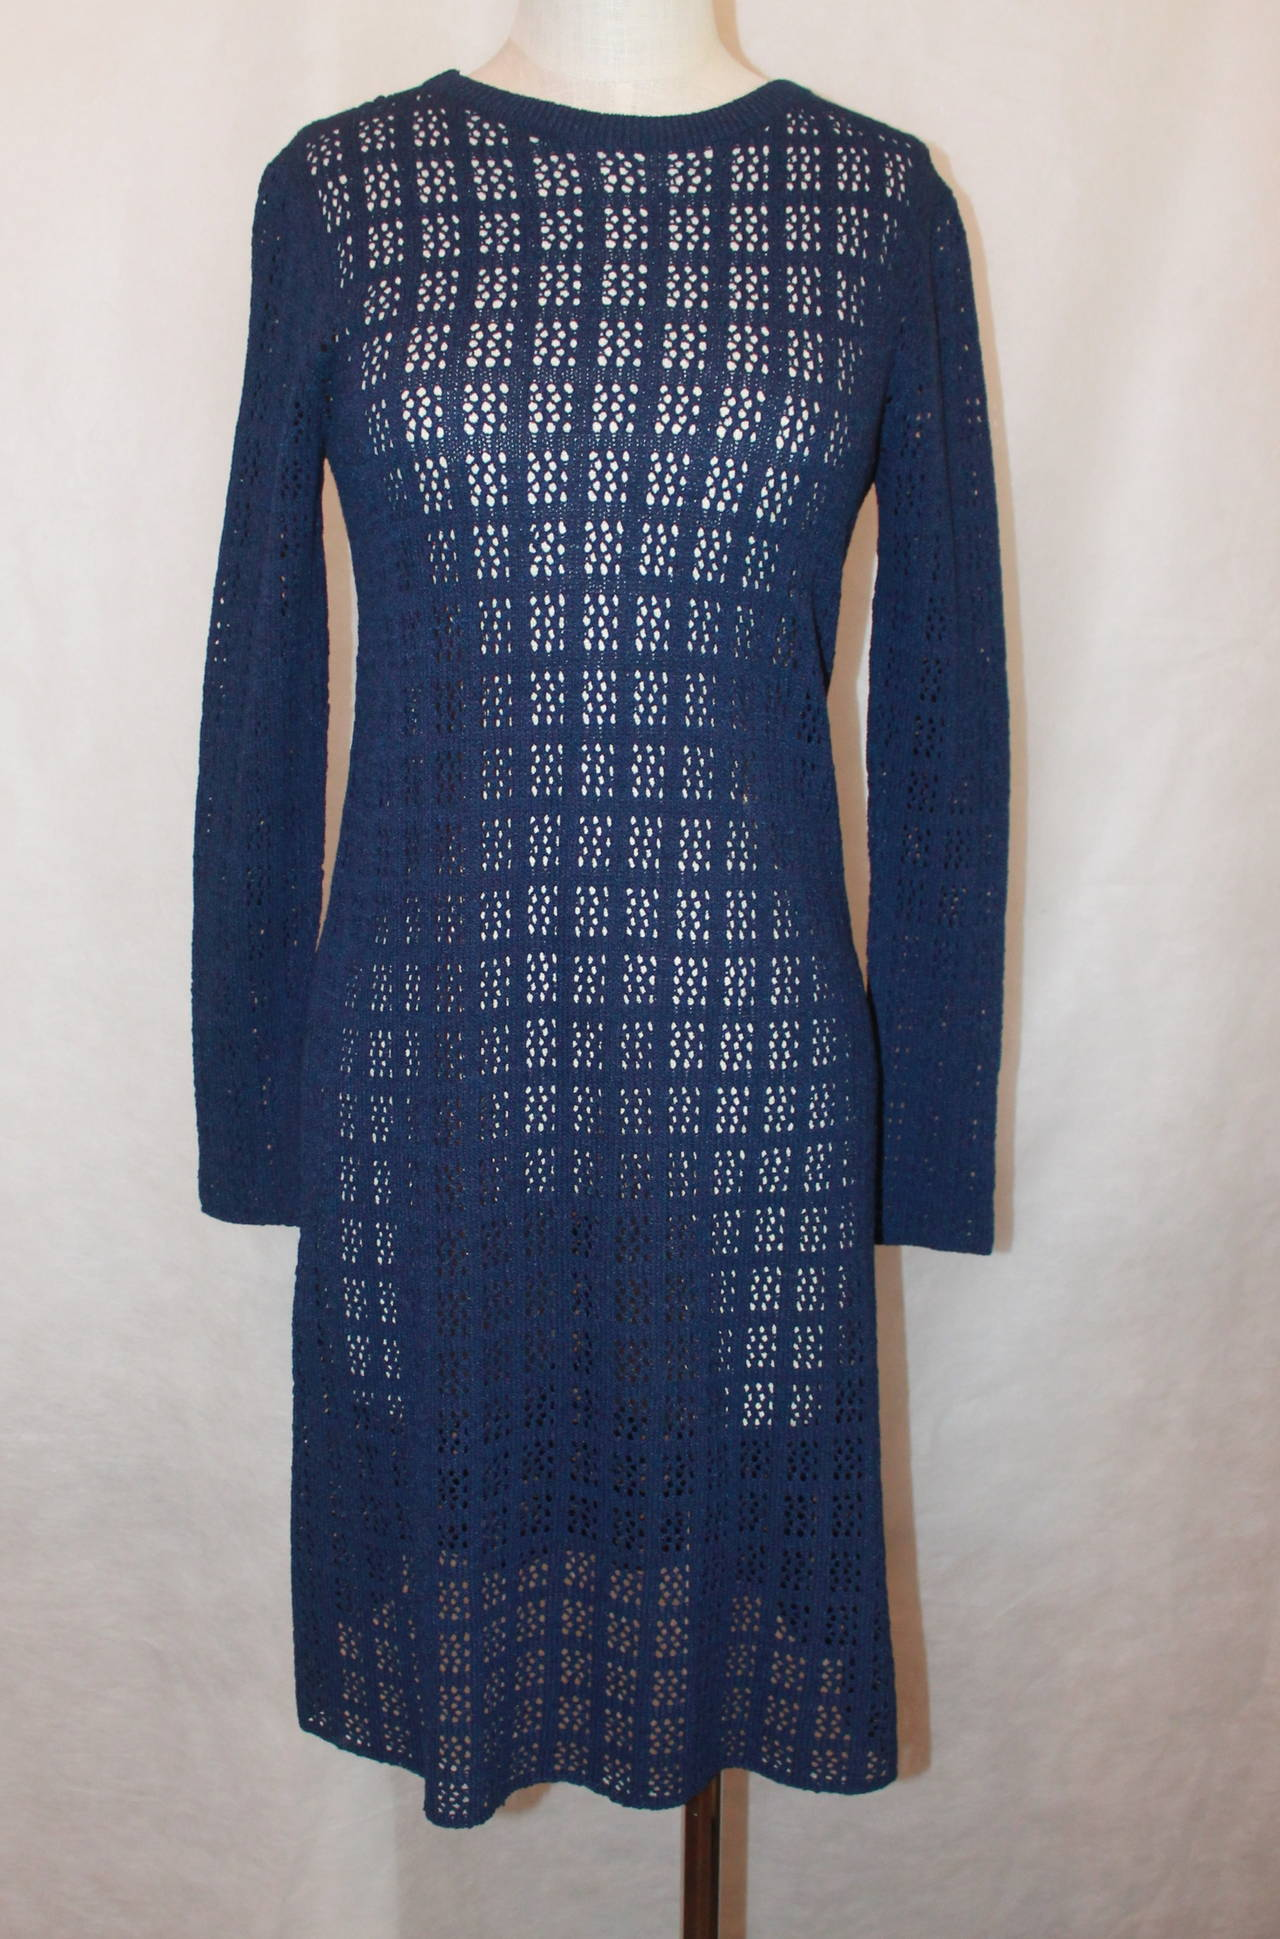 Adolfo 1960's Navy Open Knit Long Sleeve Dress - M 2